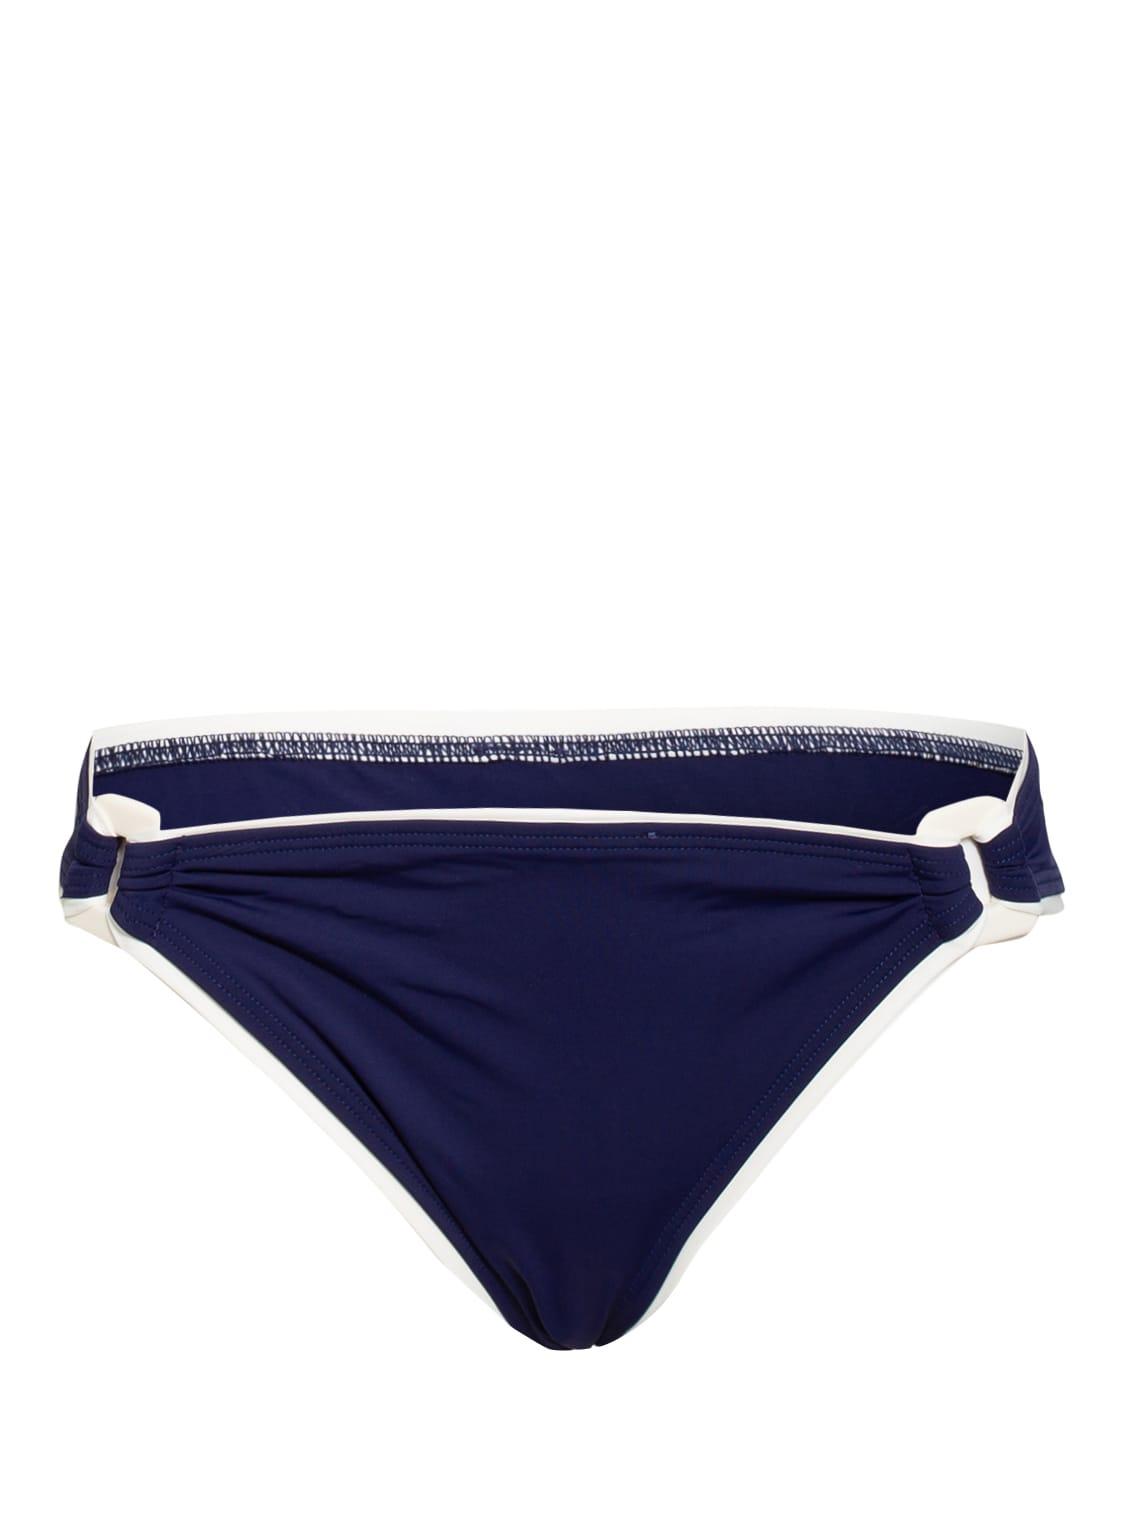 Image of Aubade Bikini-Hose La Baie Des Vagues blau